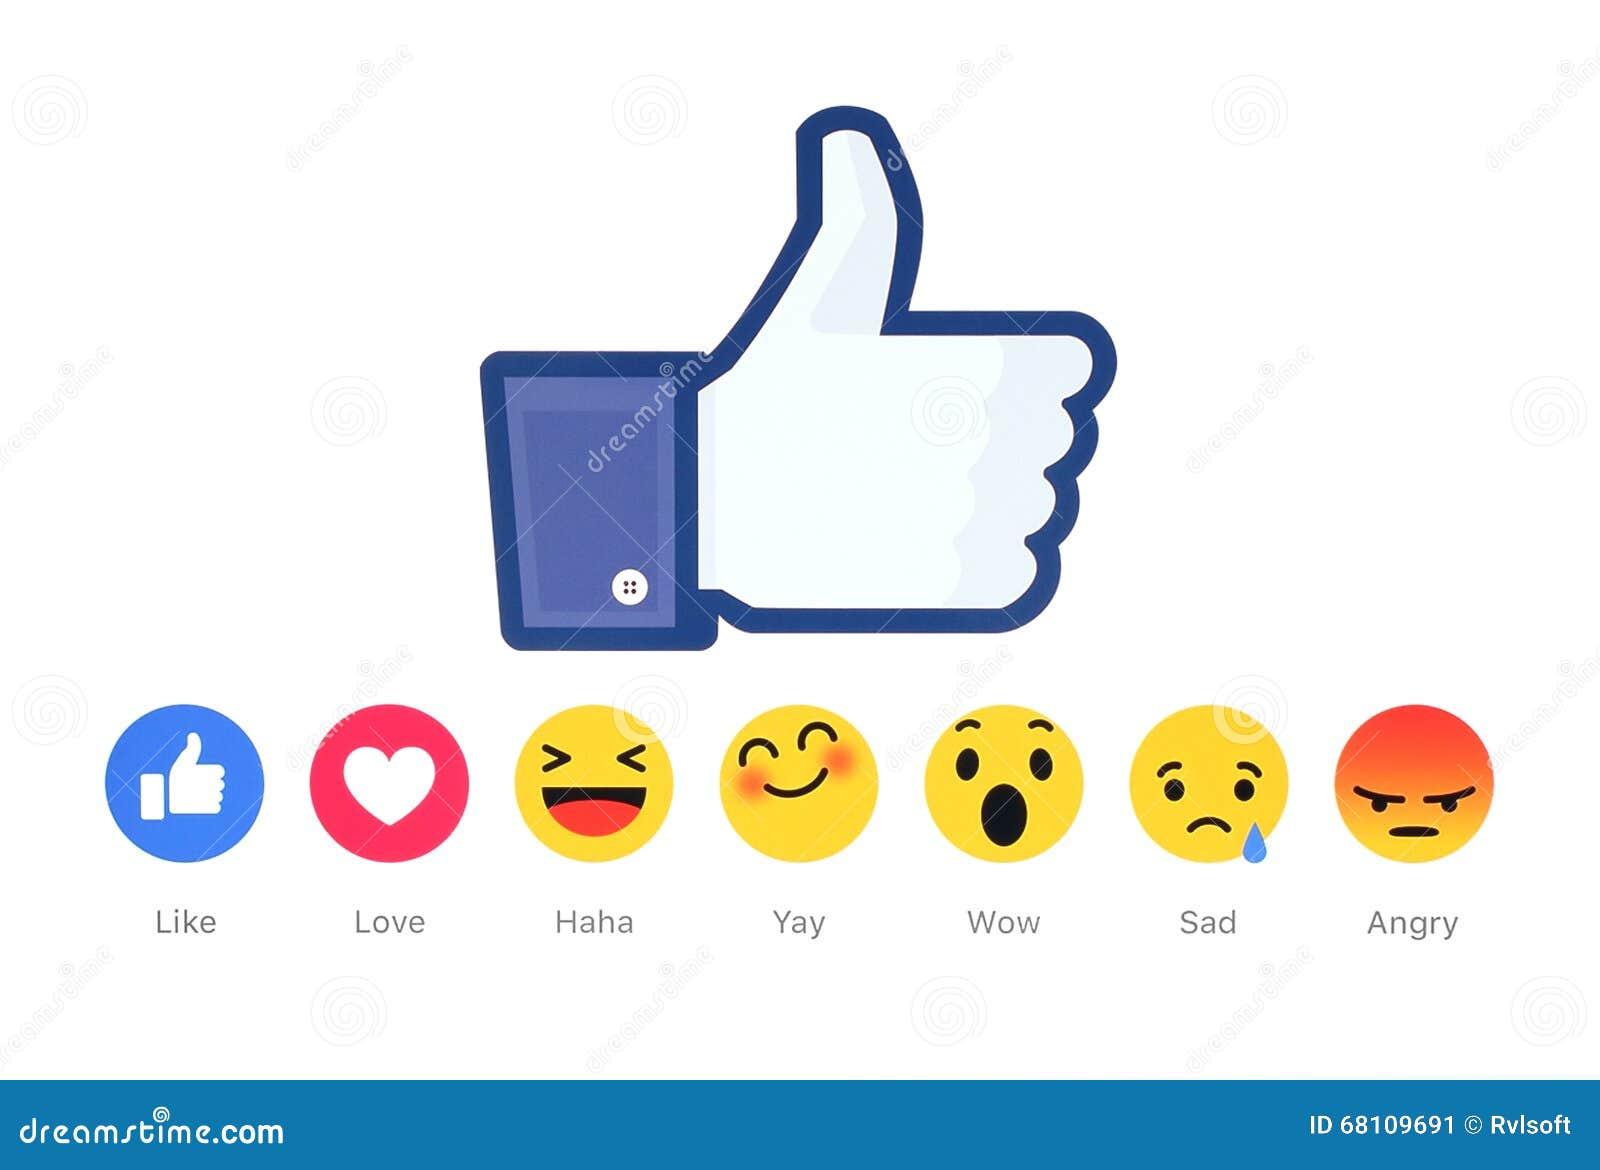 New Facebook like button 6 Empathetic Emoji Reactions